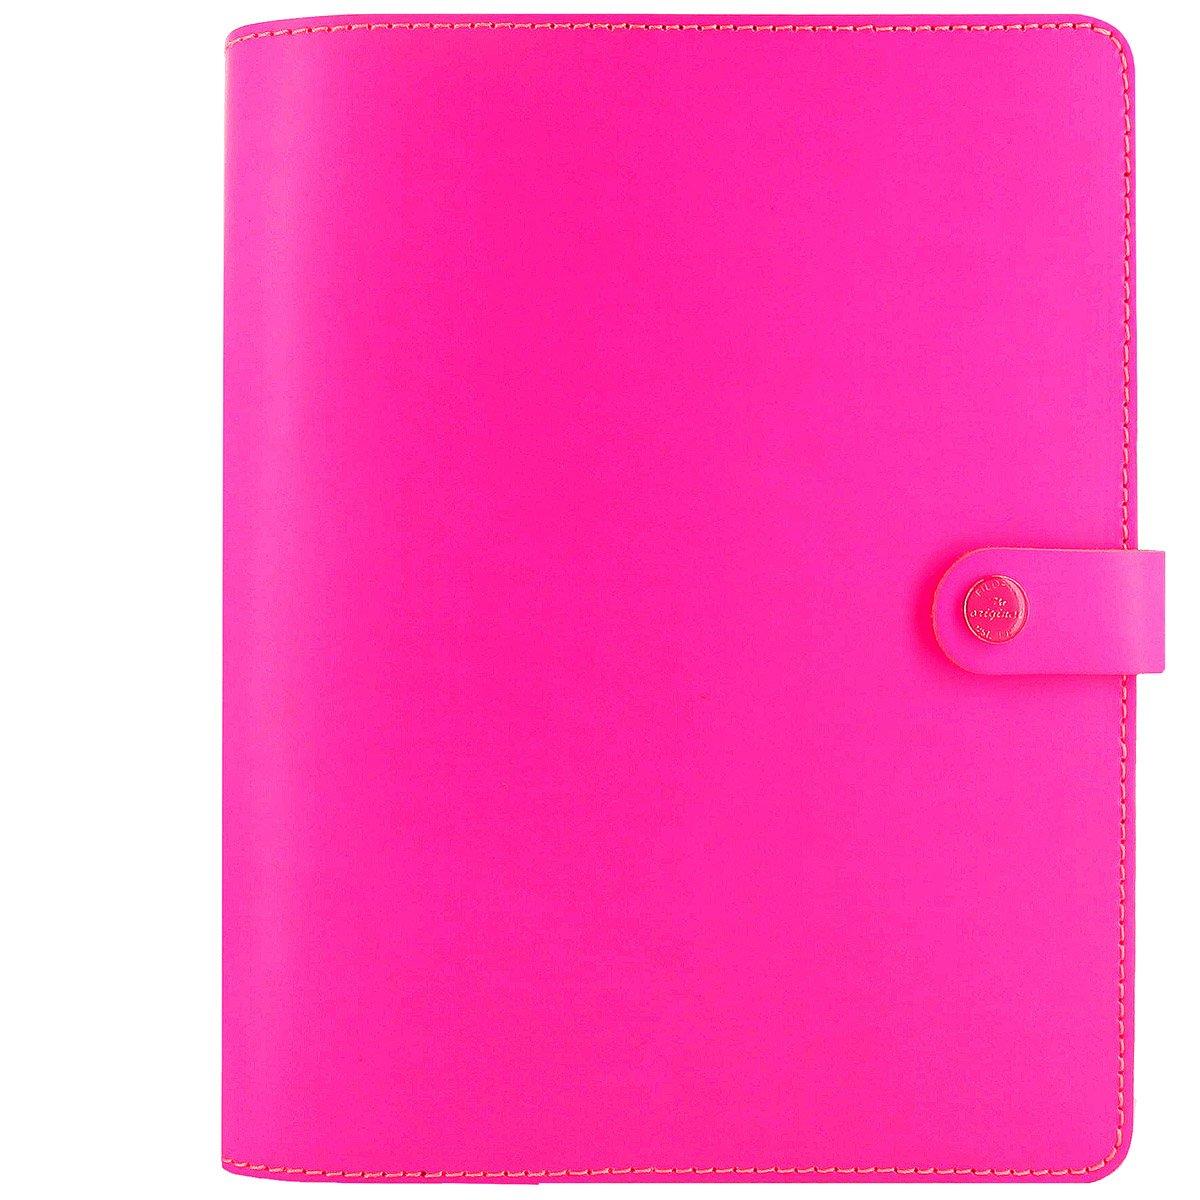 Filofax The Original A5 Fluoro Organiser - Pink